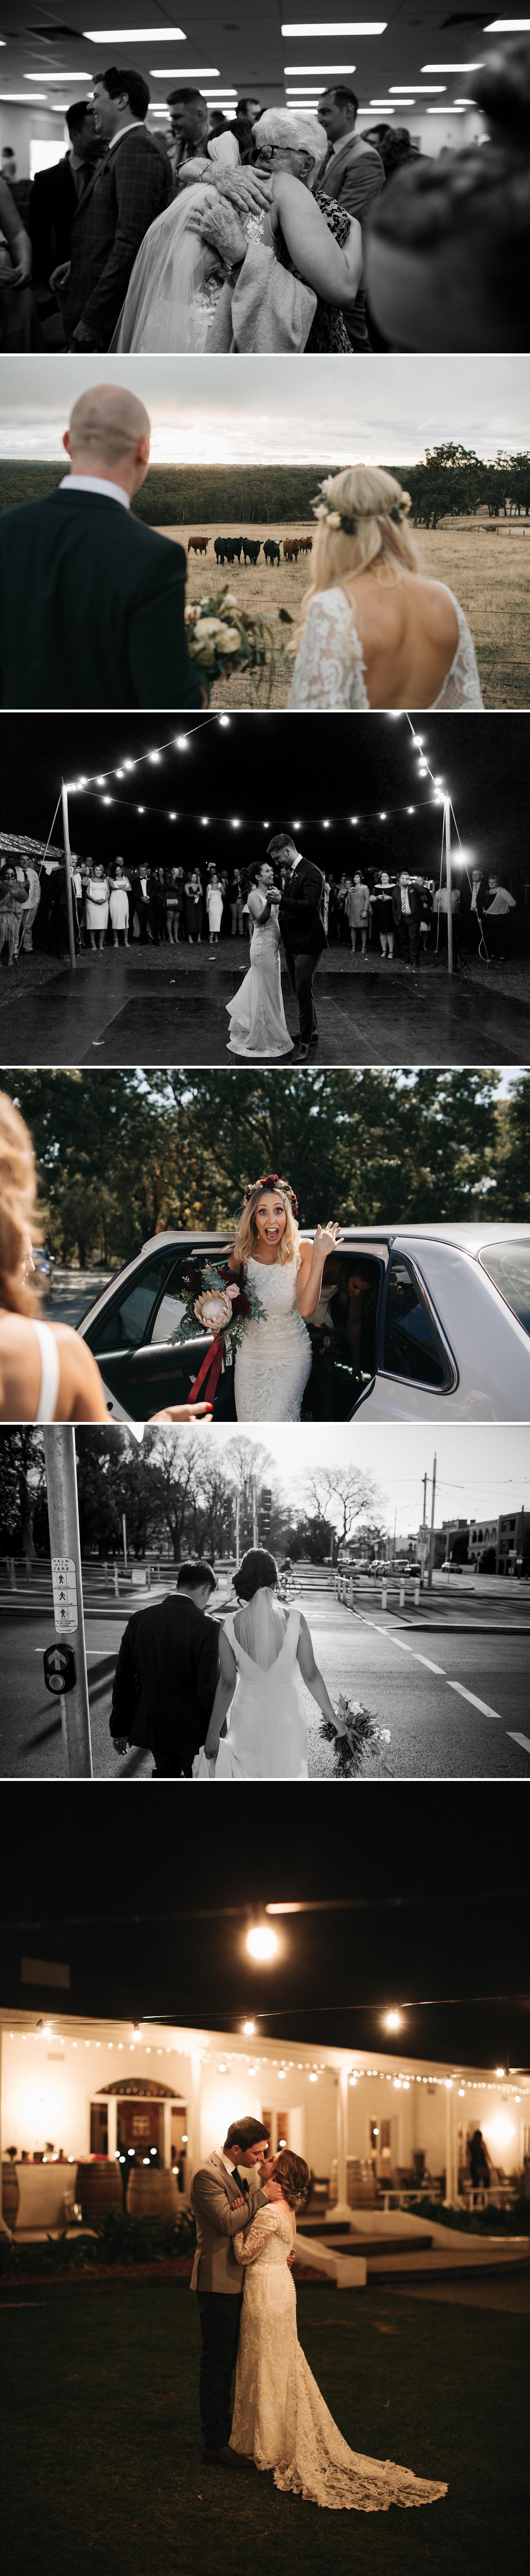 relaxed-wedding-photographer-melbourne_0019.jpg